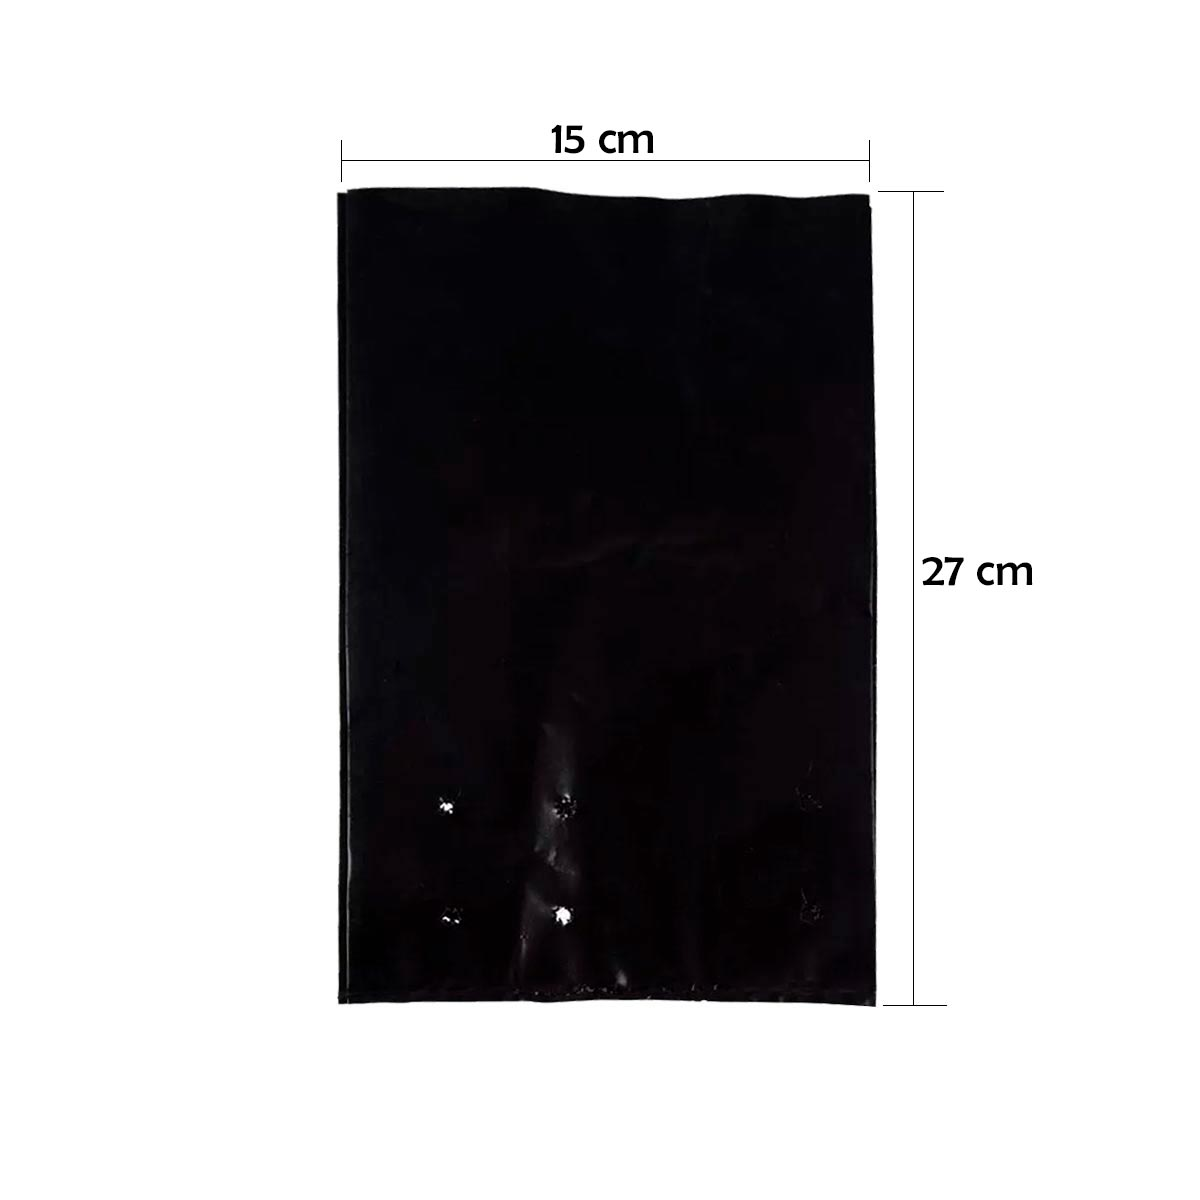 SACOLA PARA MUDA 15x27 cm - 500 UN